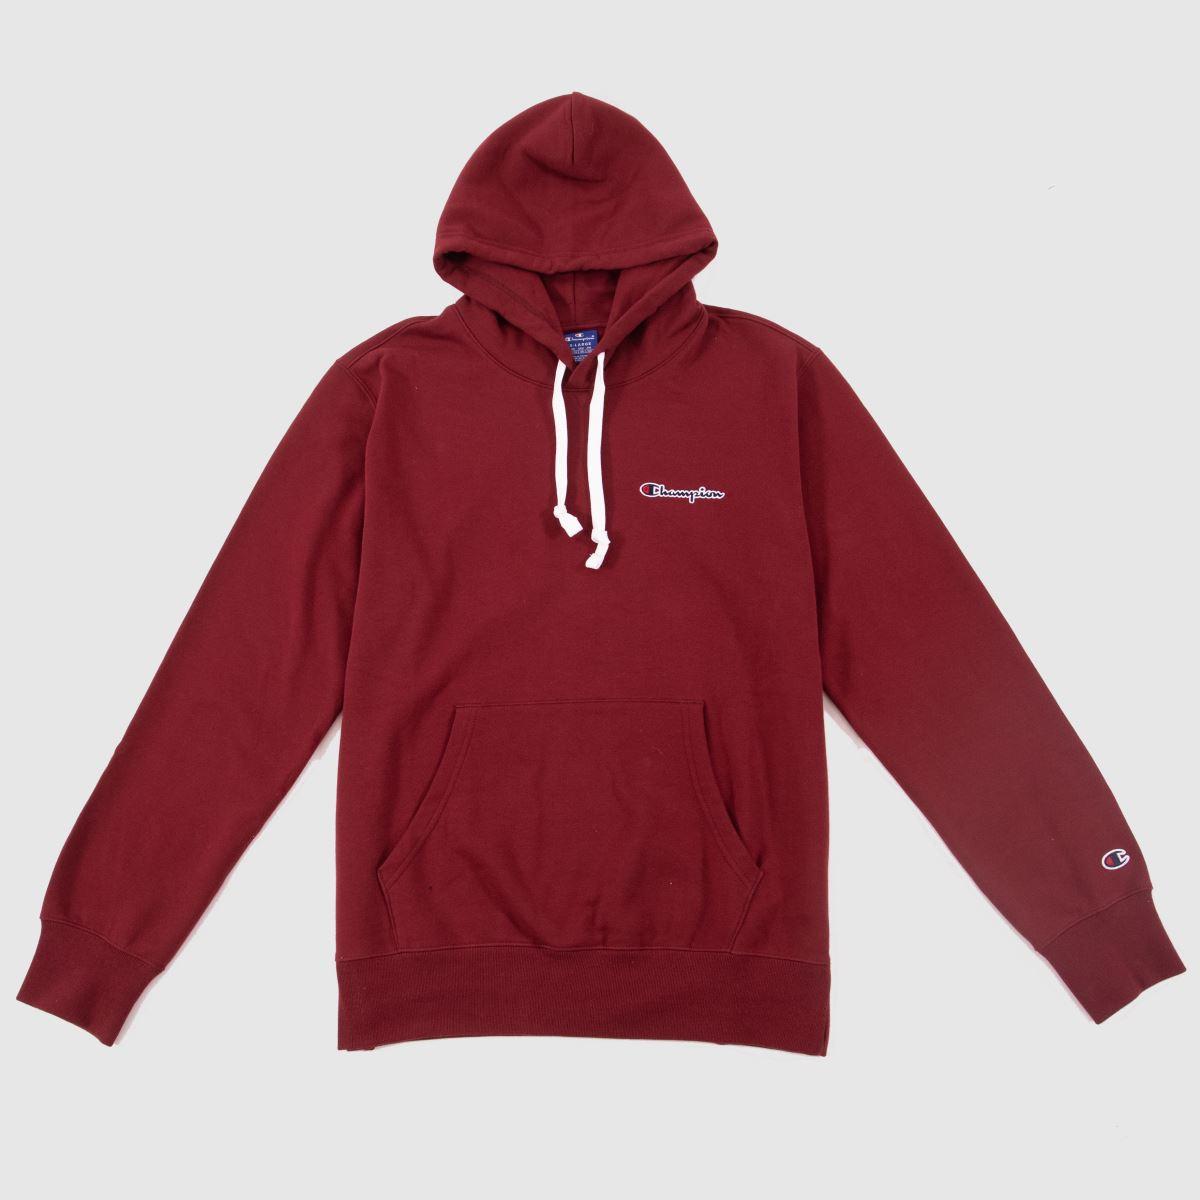 Champion Burgundy Hooded Sweatshirt